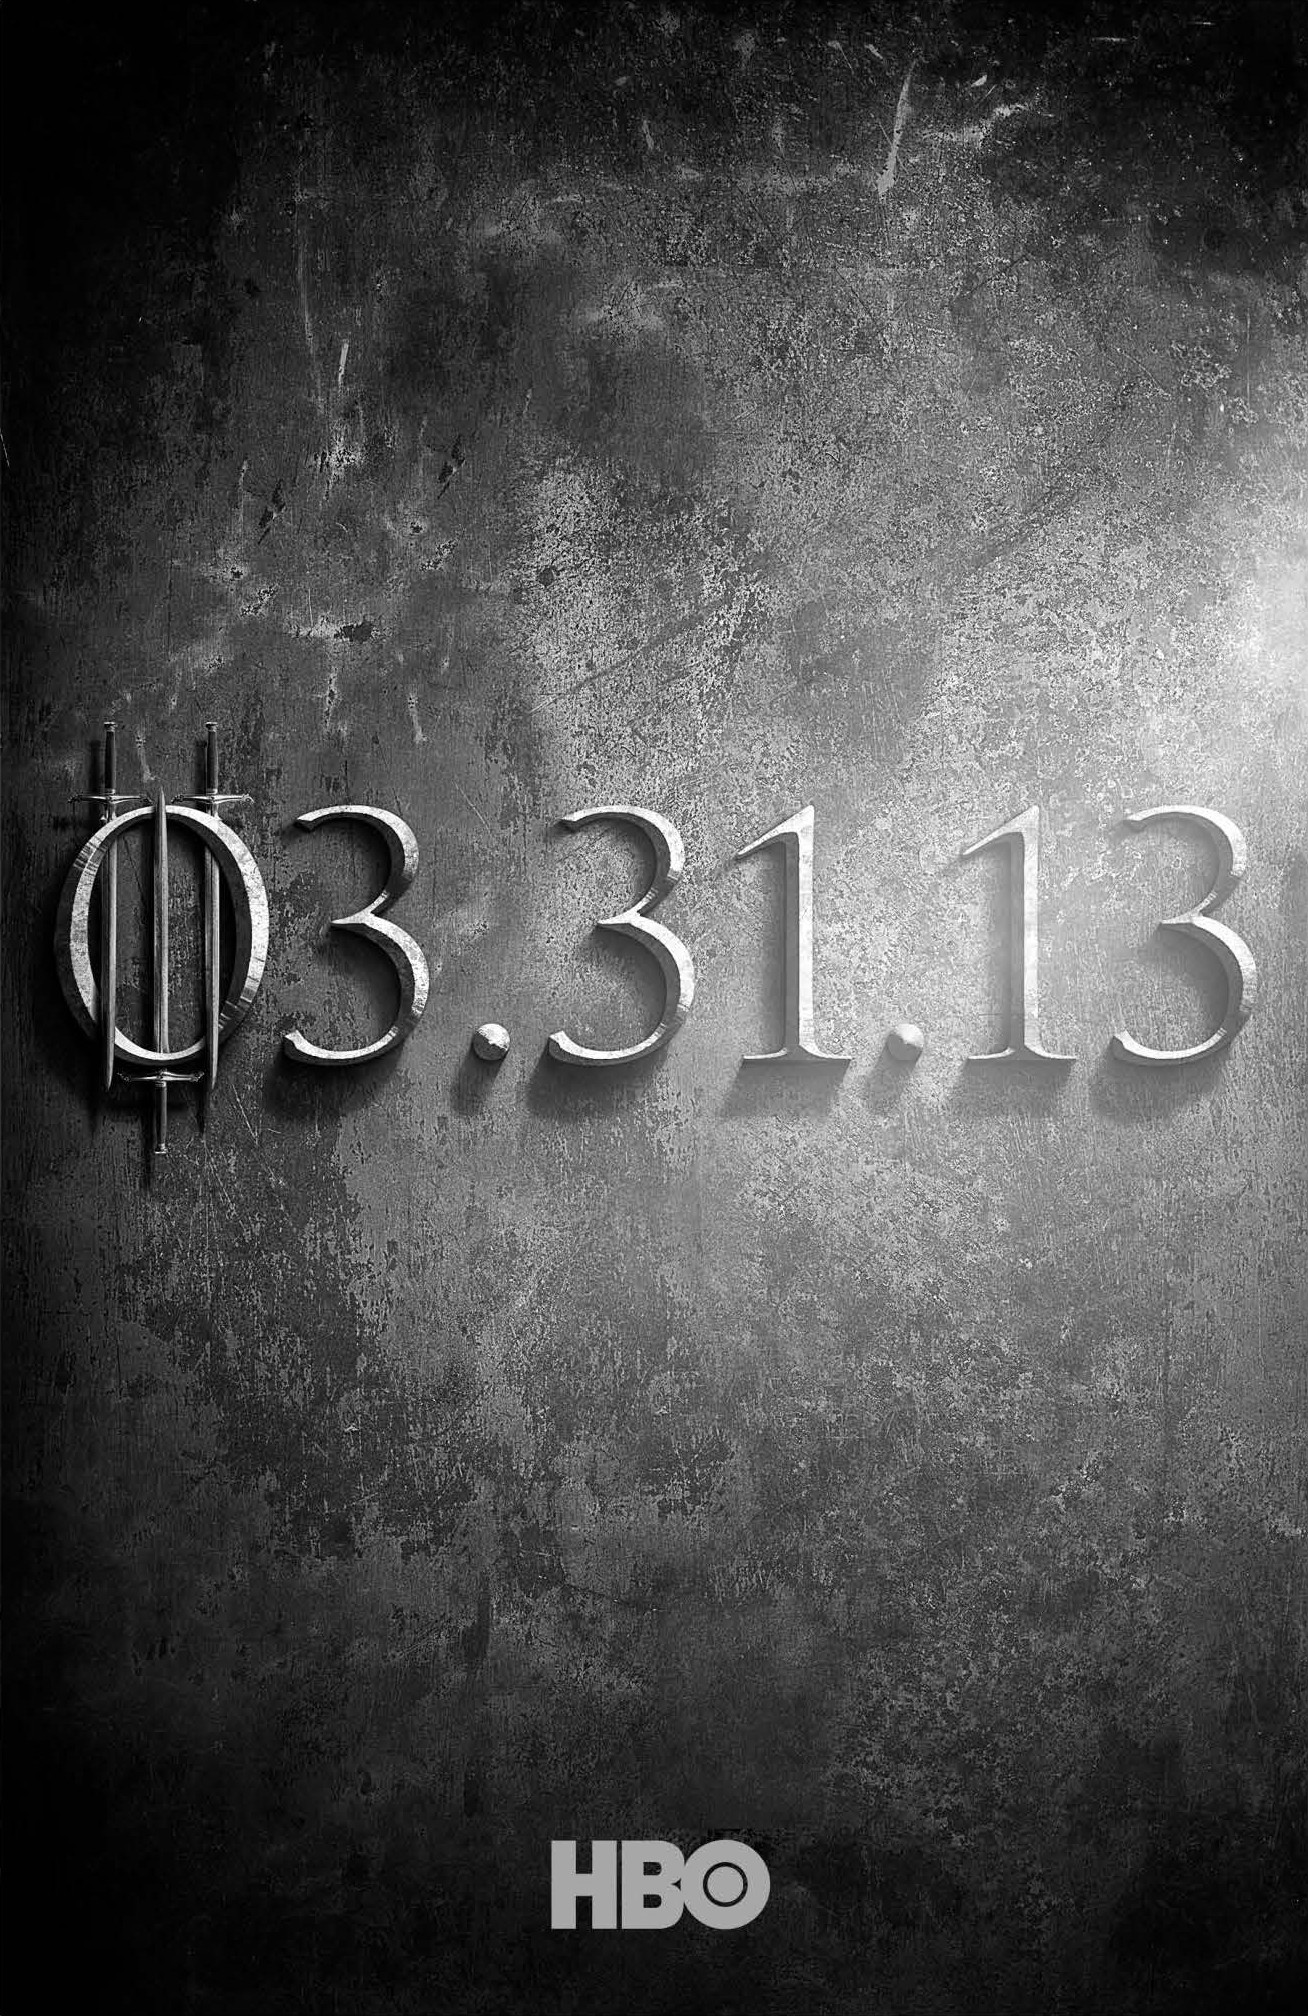 GoT Season 3 teaser